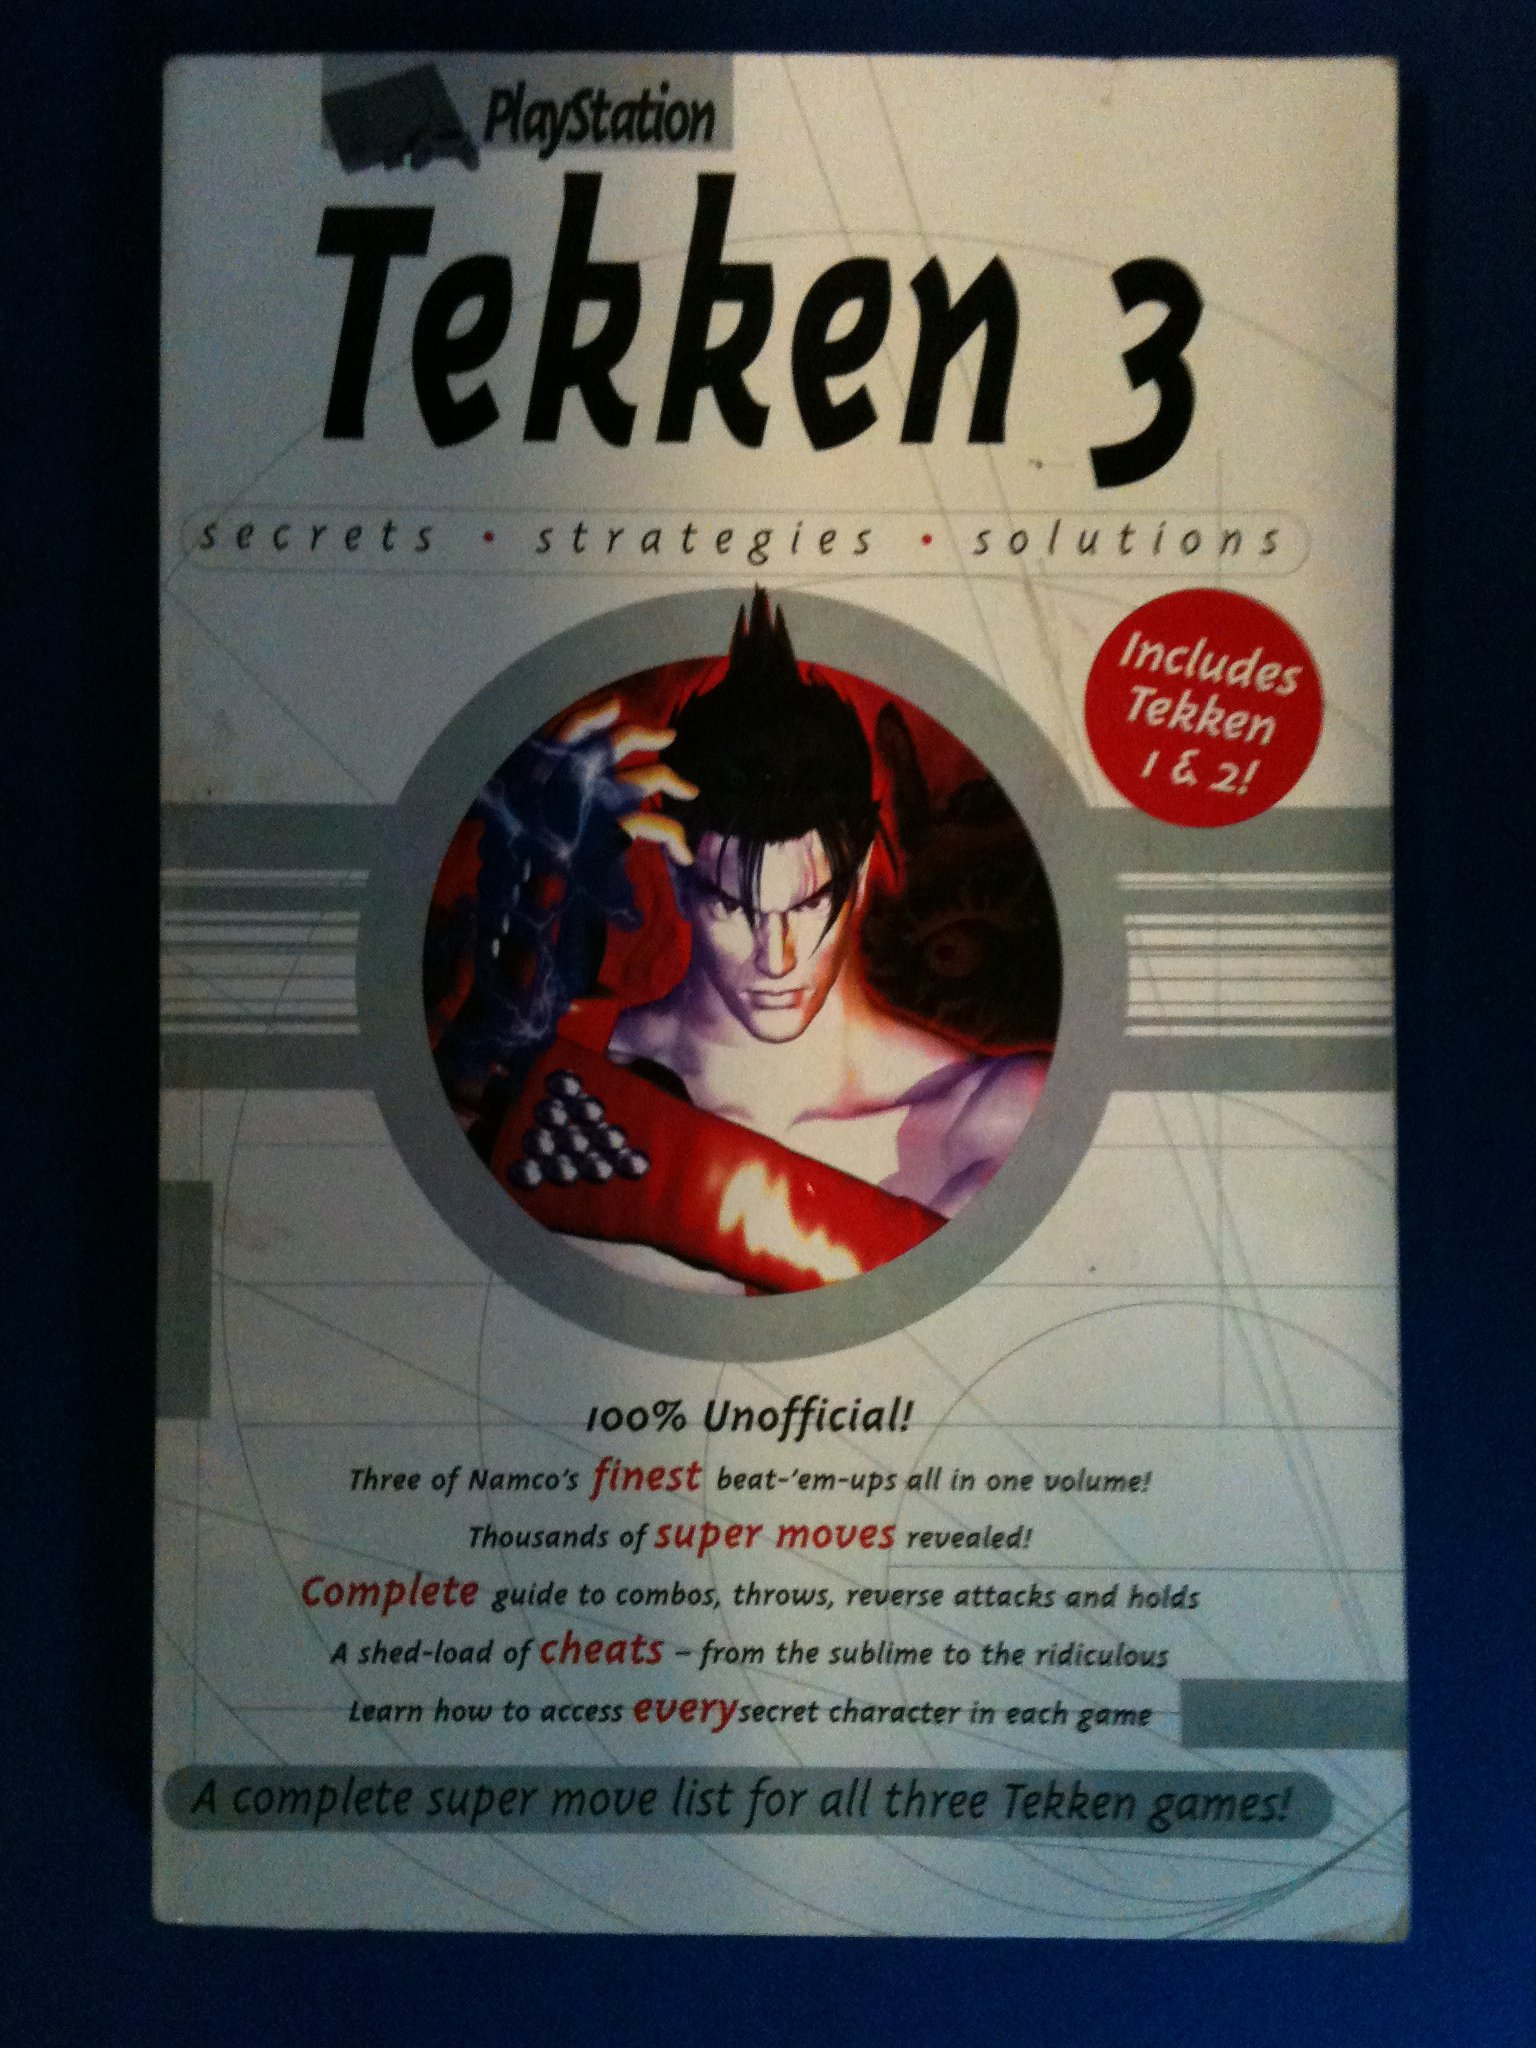 Tekken 3: Secrets, Strategies, Solutions: Louise Wells, Ryan Butt